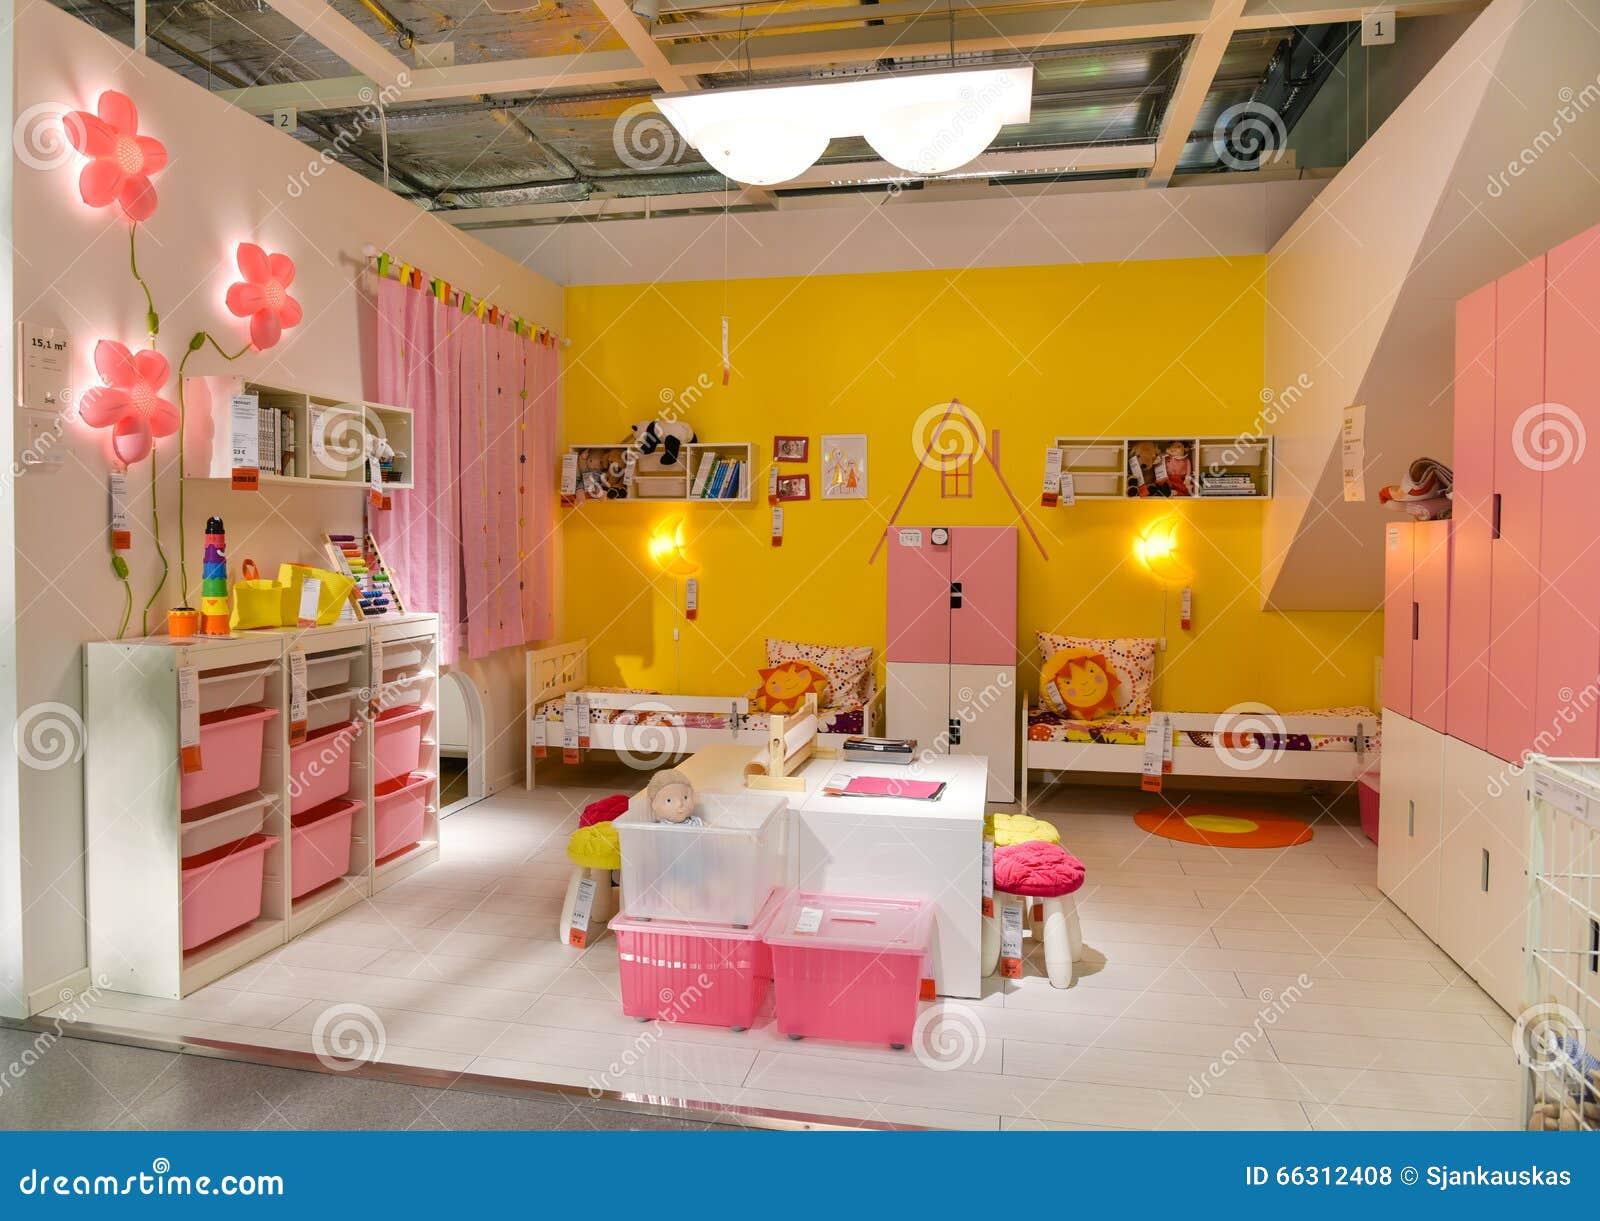 dedd193b07f Έπιπλα δωματίων παιδιών στη Ikea Εκδοτική Στοκ Εικόνες - εικόνα από ...